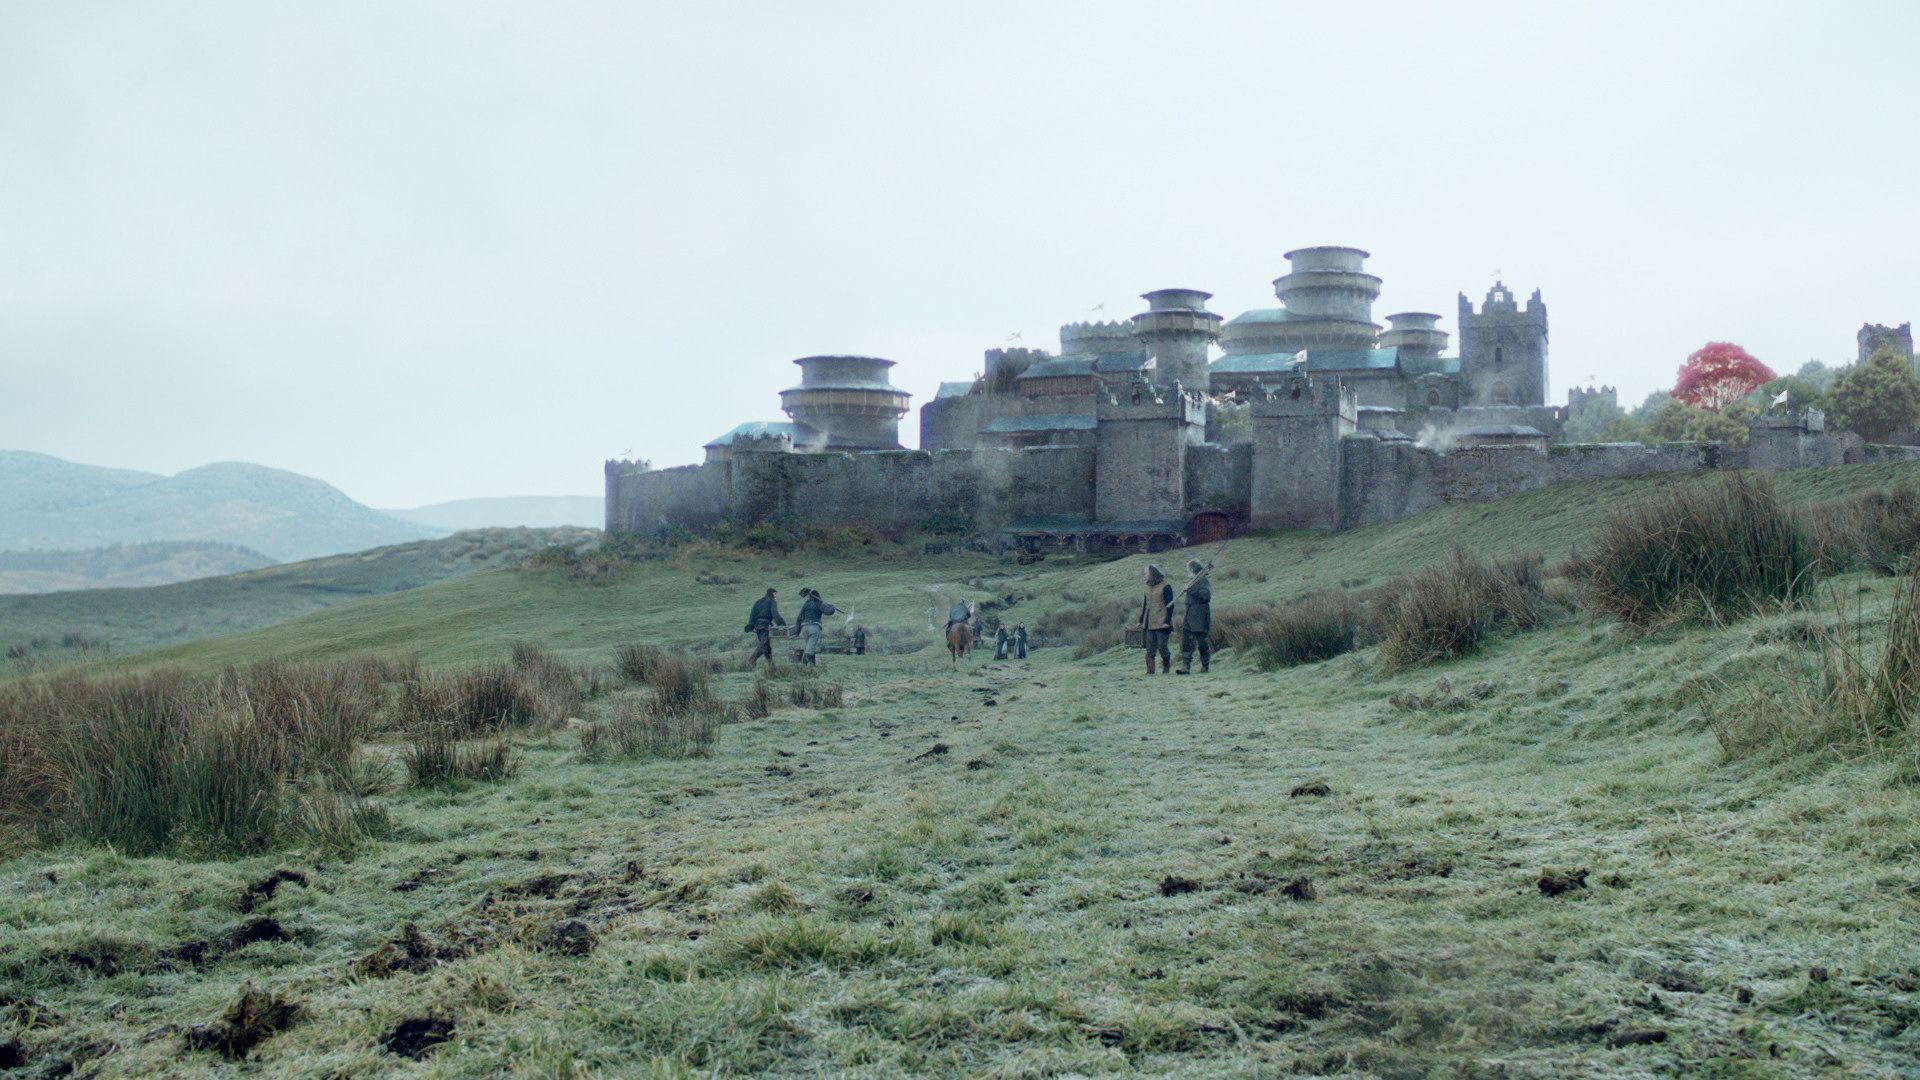 پیشینه سریال بازی تاج و تخت   تایید ساخت اسپین آف game of thrones